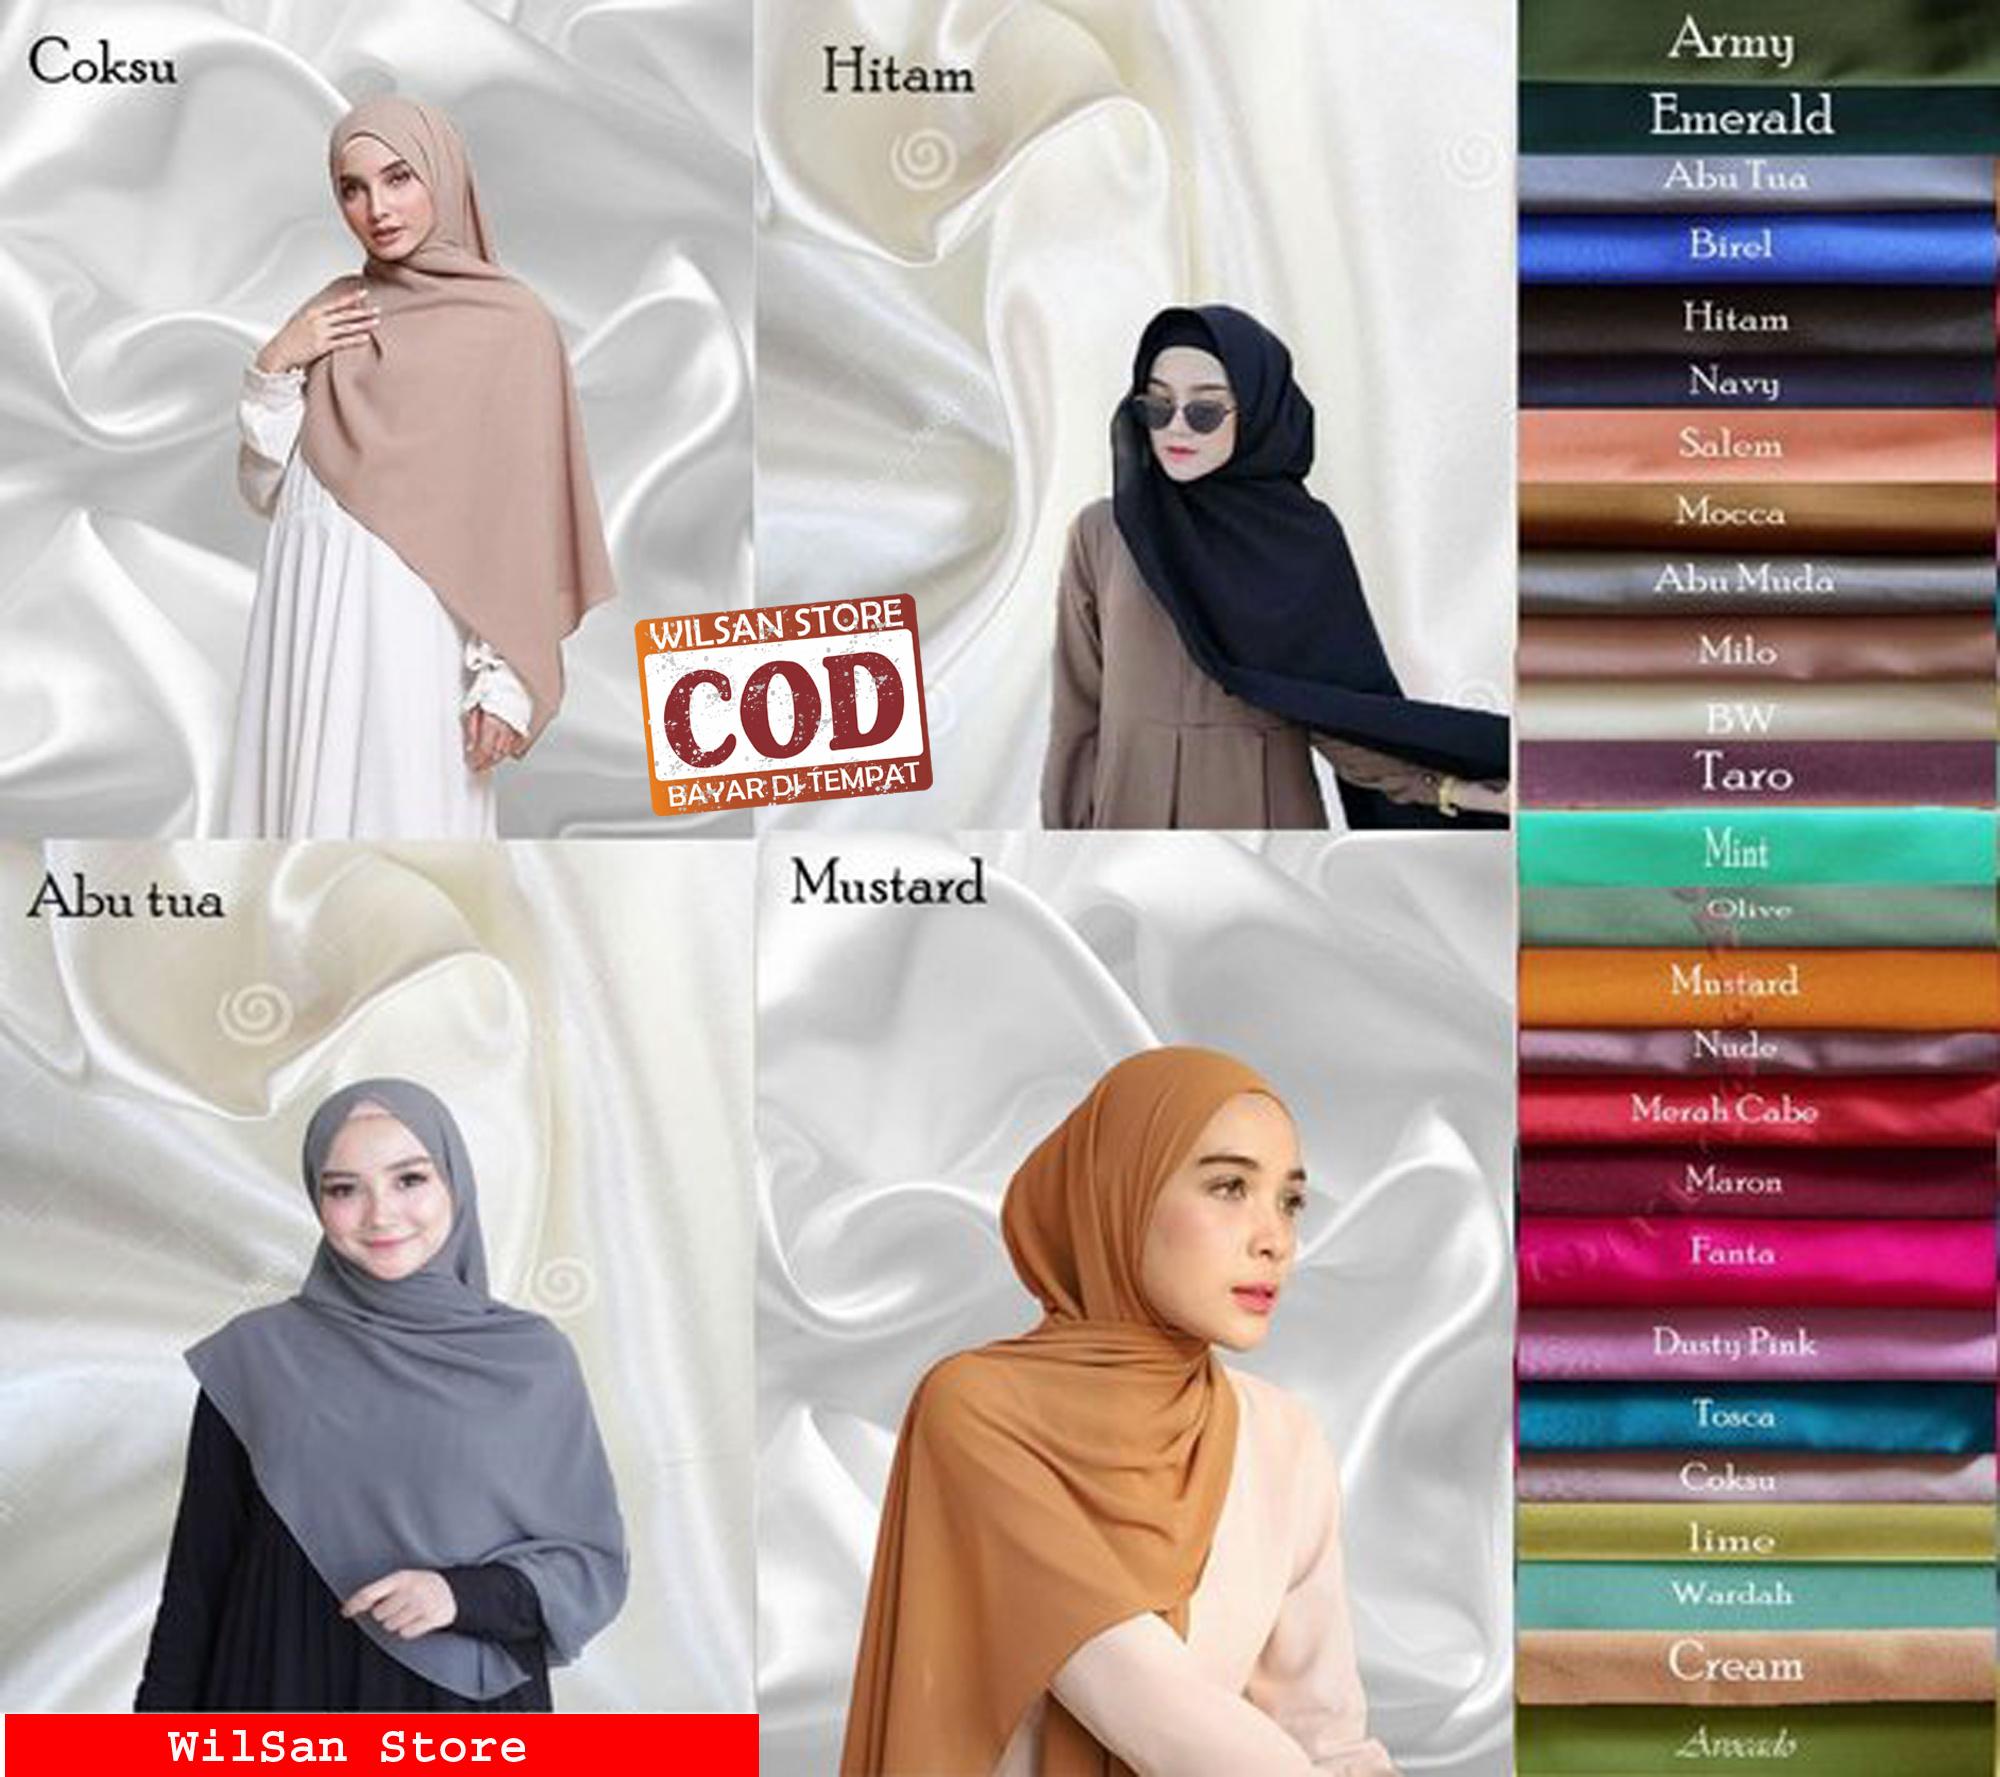 WS_Hijab/Jilbab/Kerudung PASHMINA Diamond Crepe / Diamond Italiano Terbaru  12 Murah Warna Terlengkap